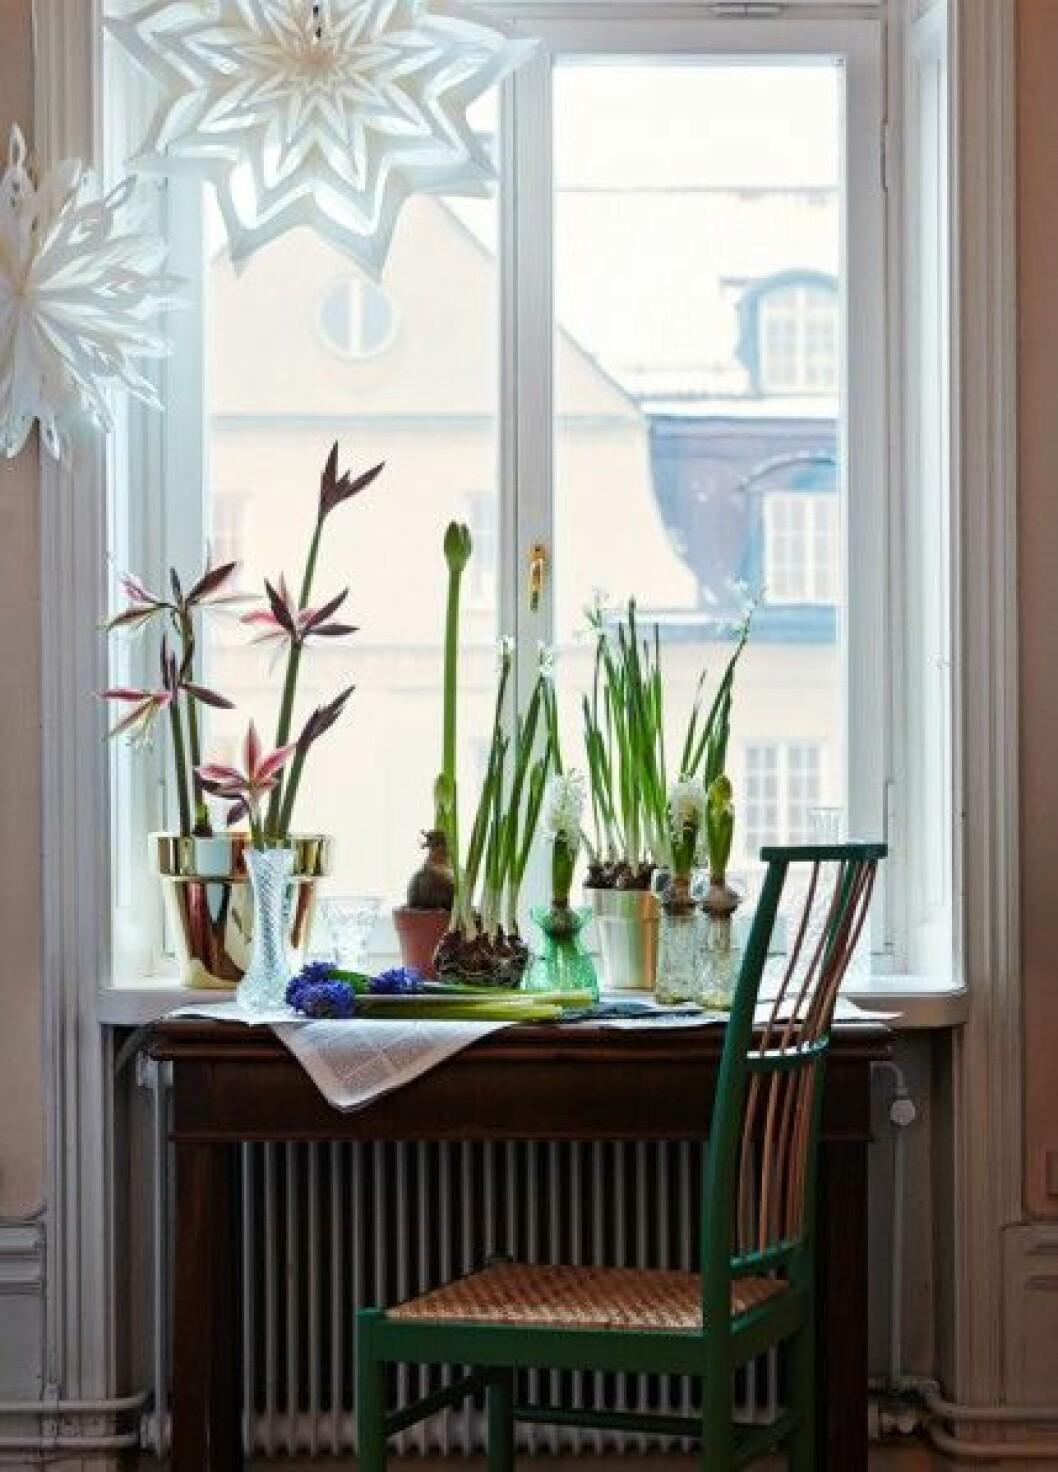 Julblommor-inspiration-amaryllis-julstjarnor